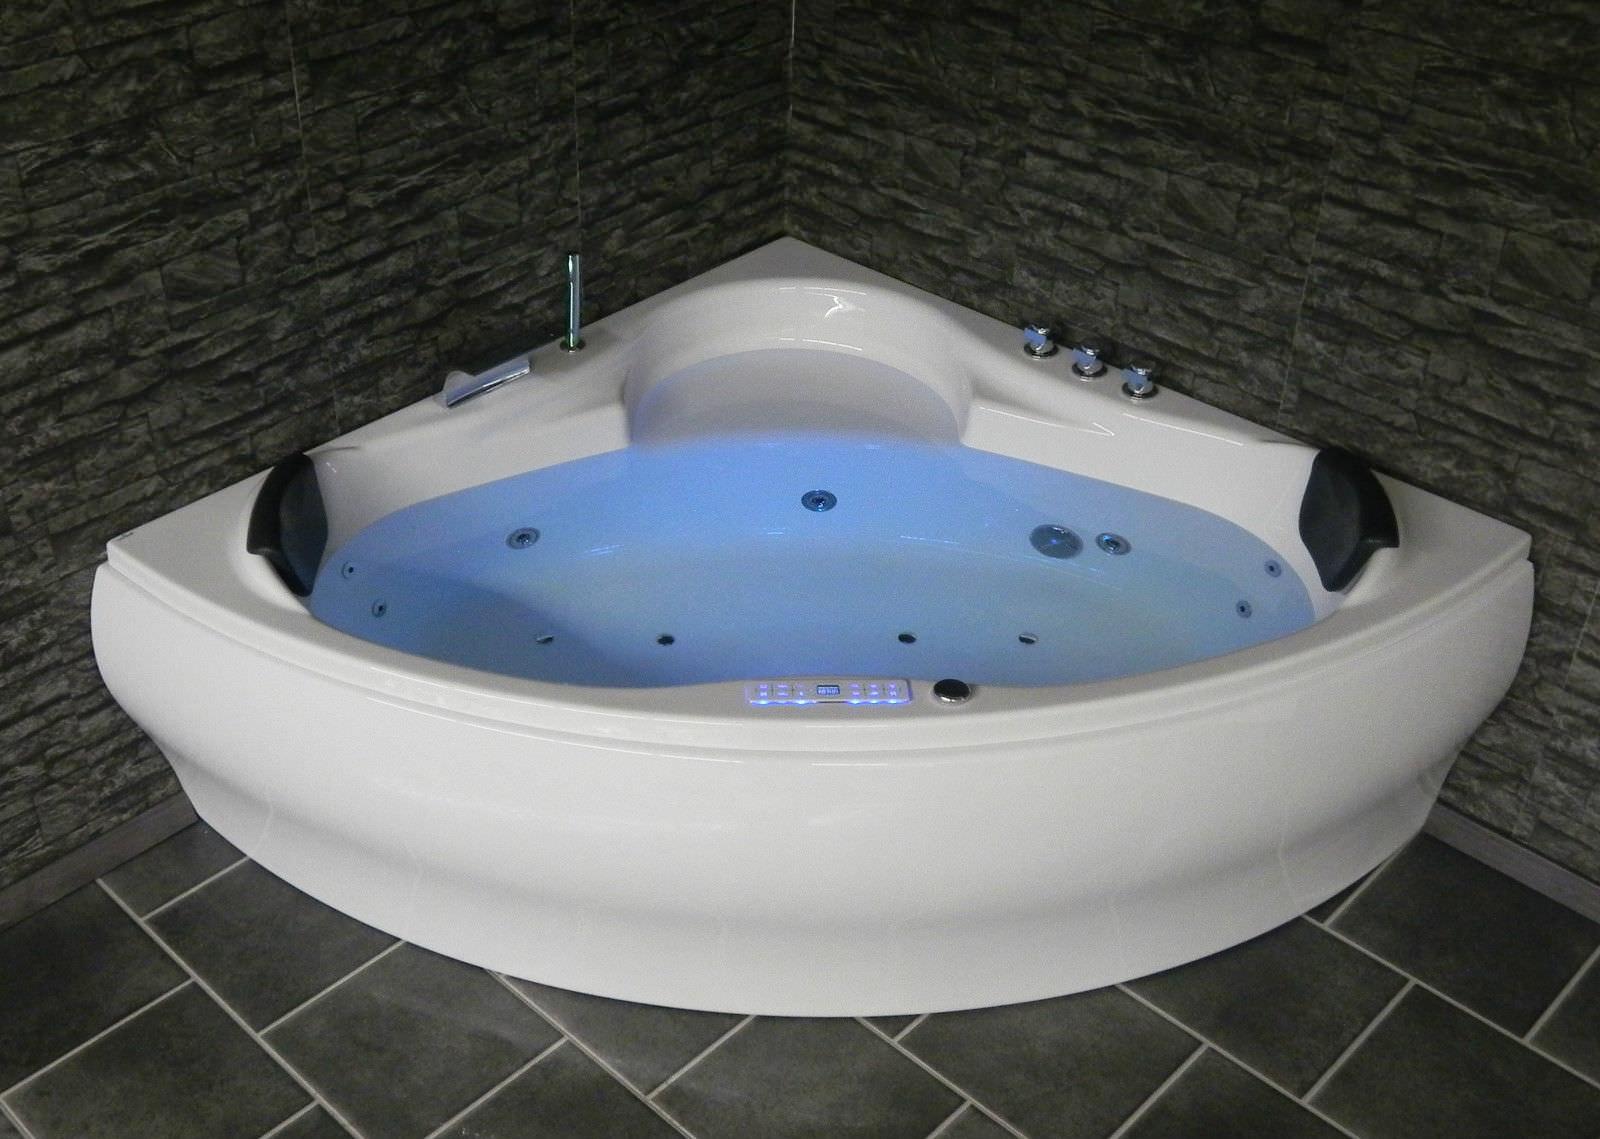 eckwhirlpool whirlpool badewanne jacuzzi pool lxw dina. Black Bedroom Furniture Sets. Home Design Ideas